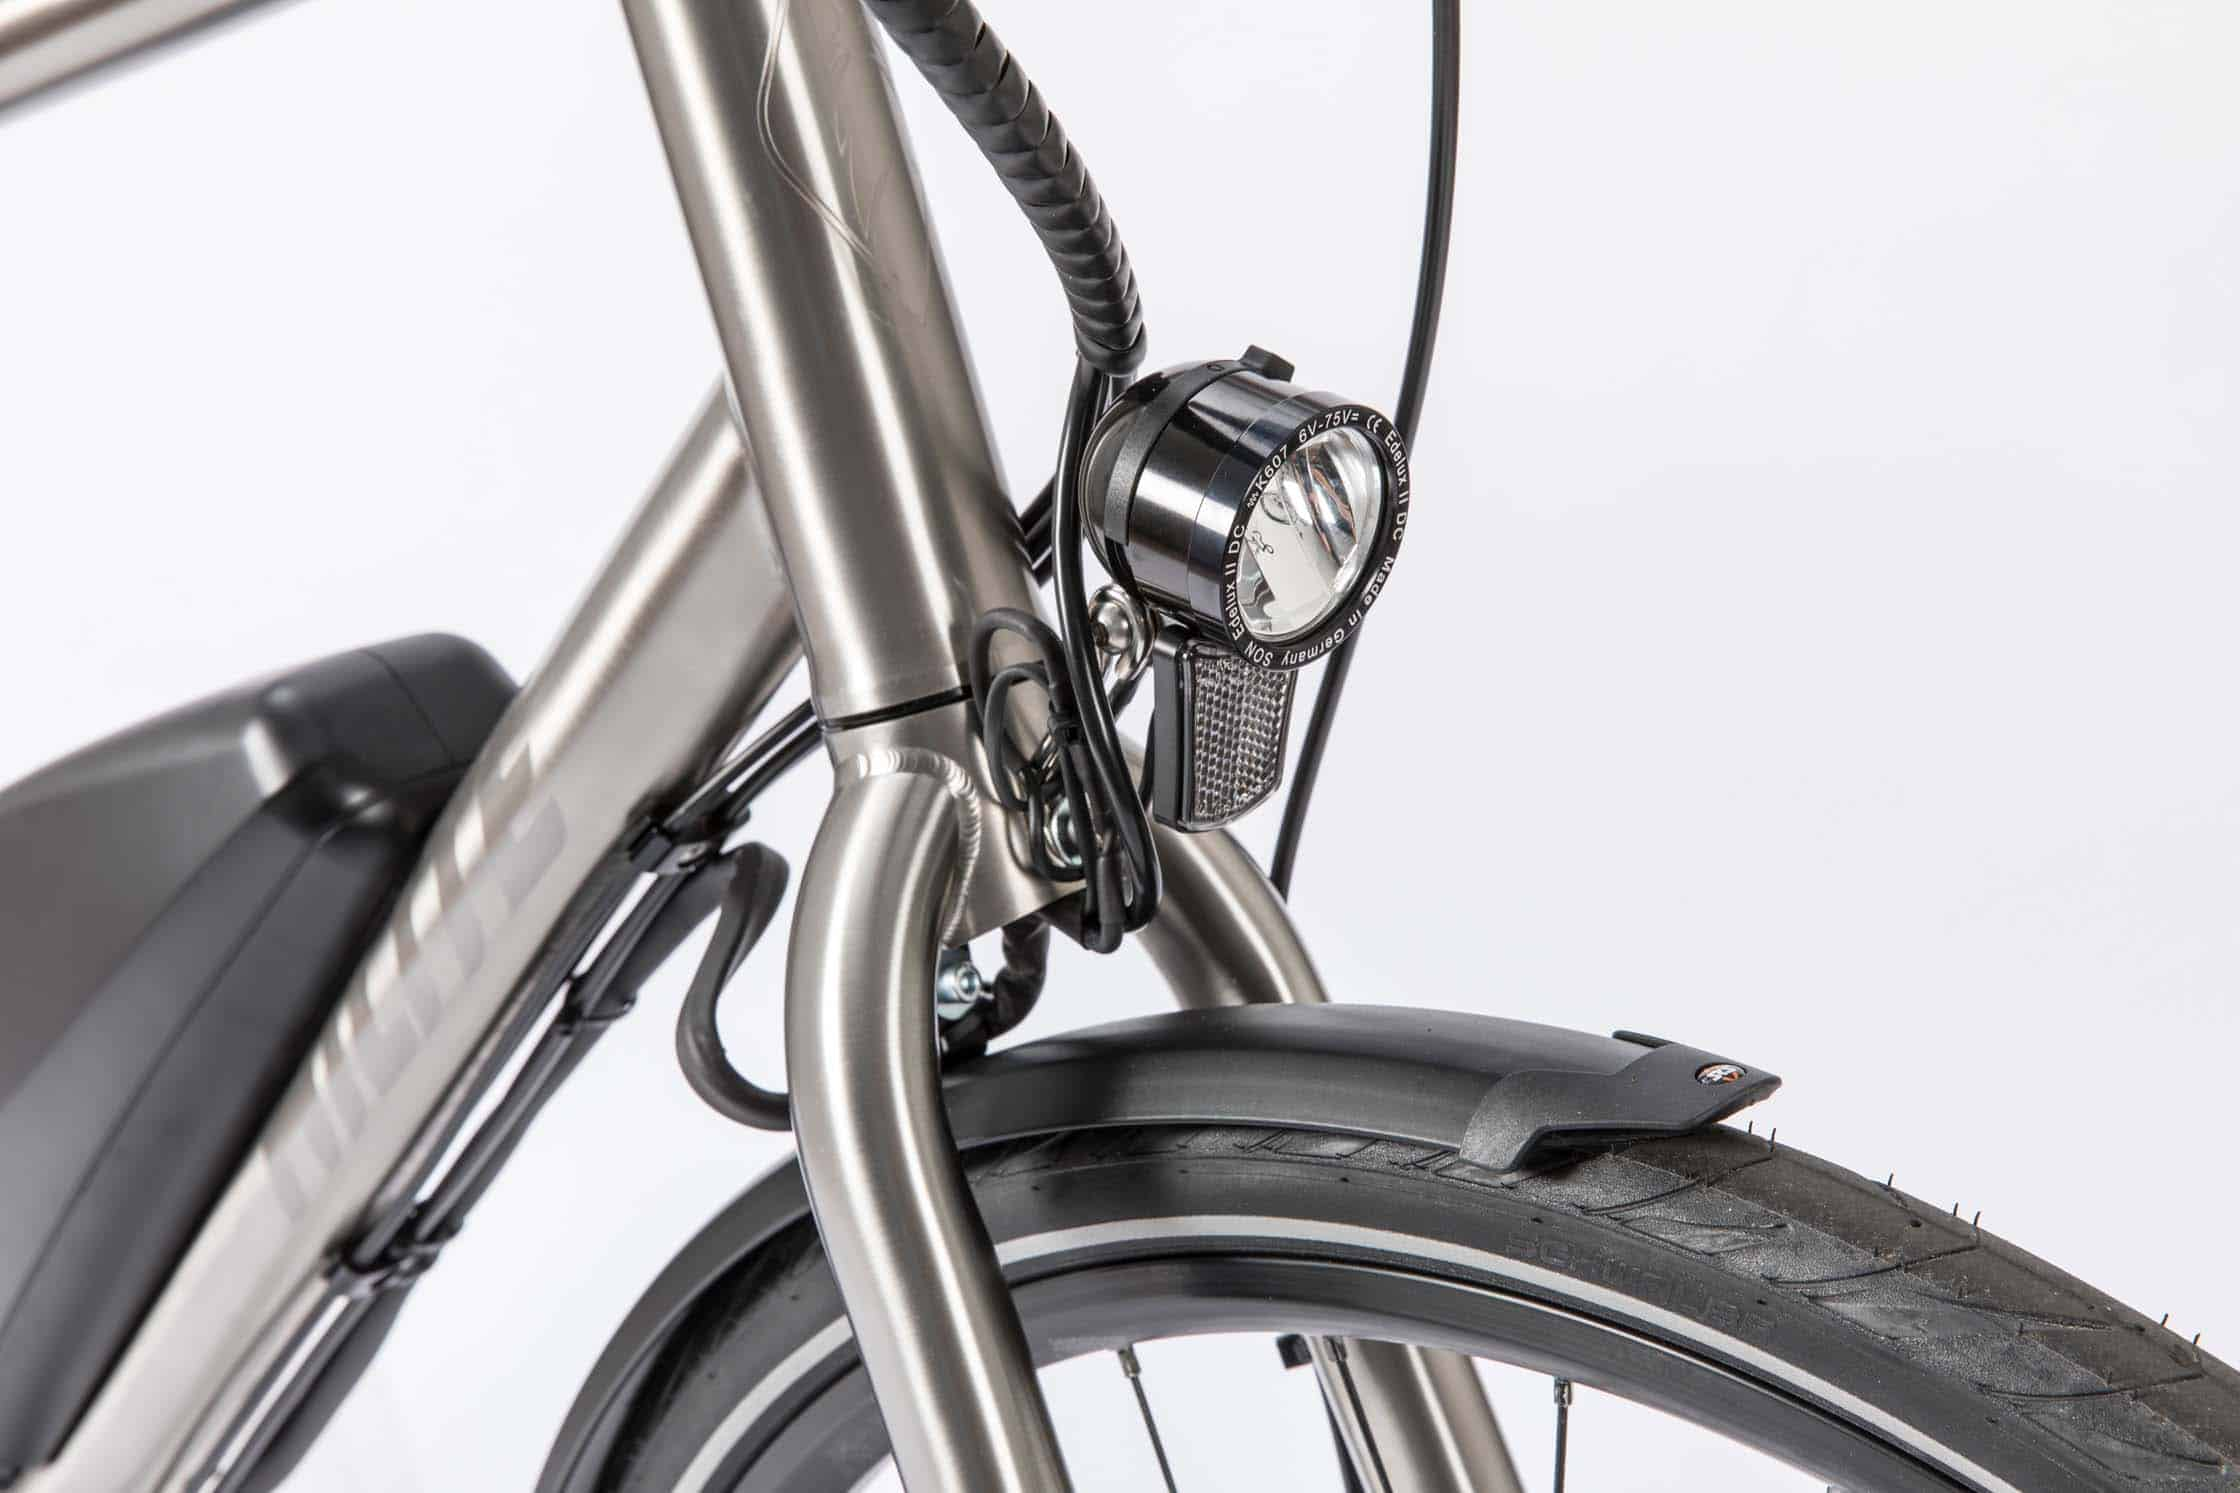 Titan_E-Bike_Pinion_Gates_Fahrradriemen_03_min